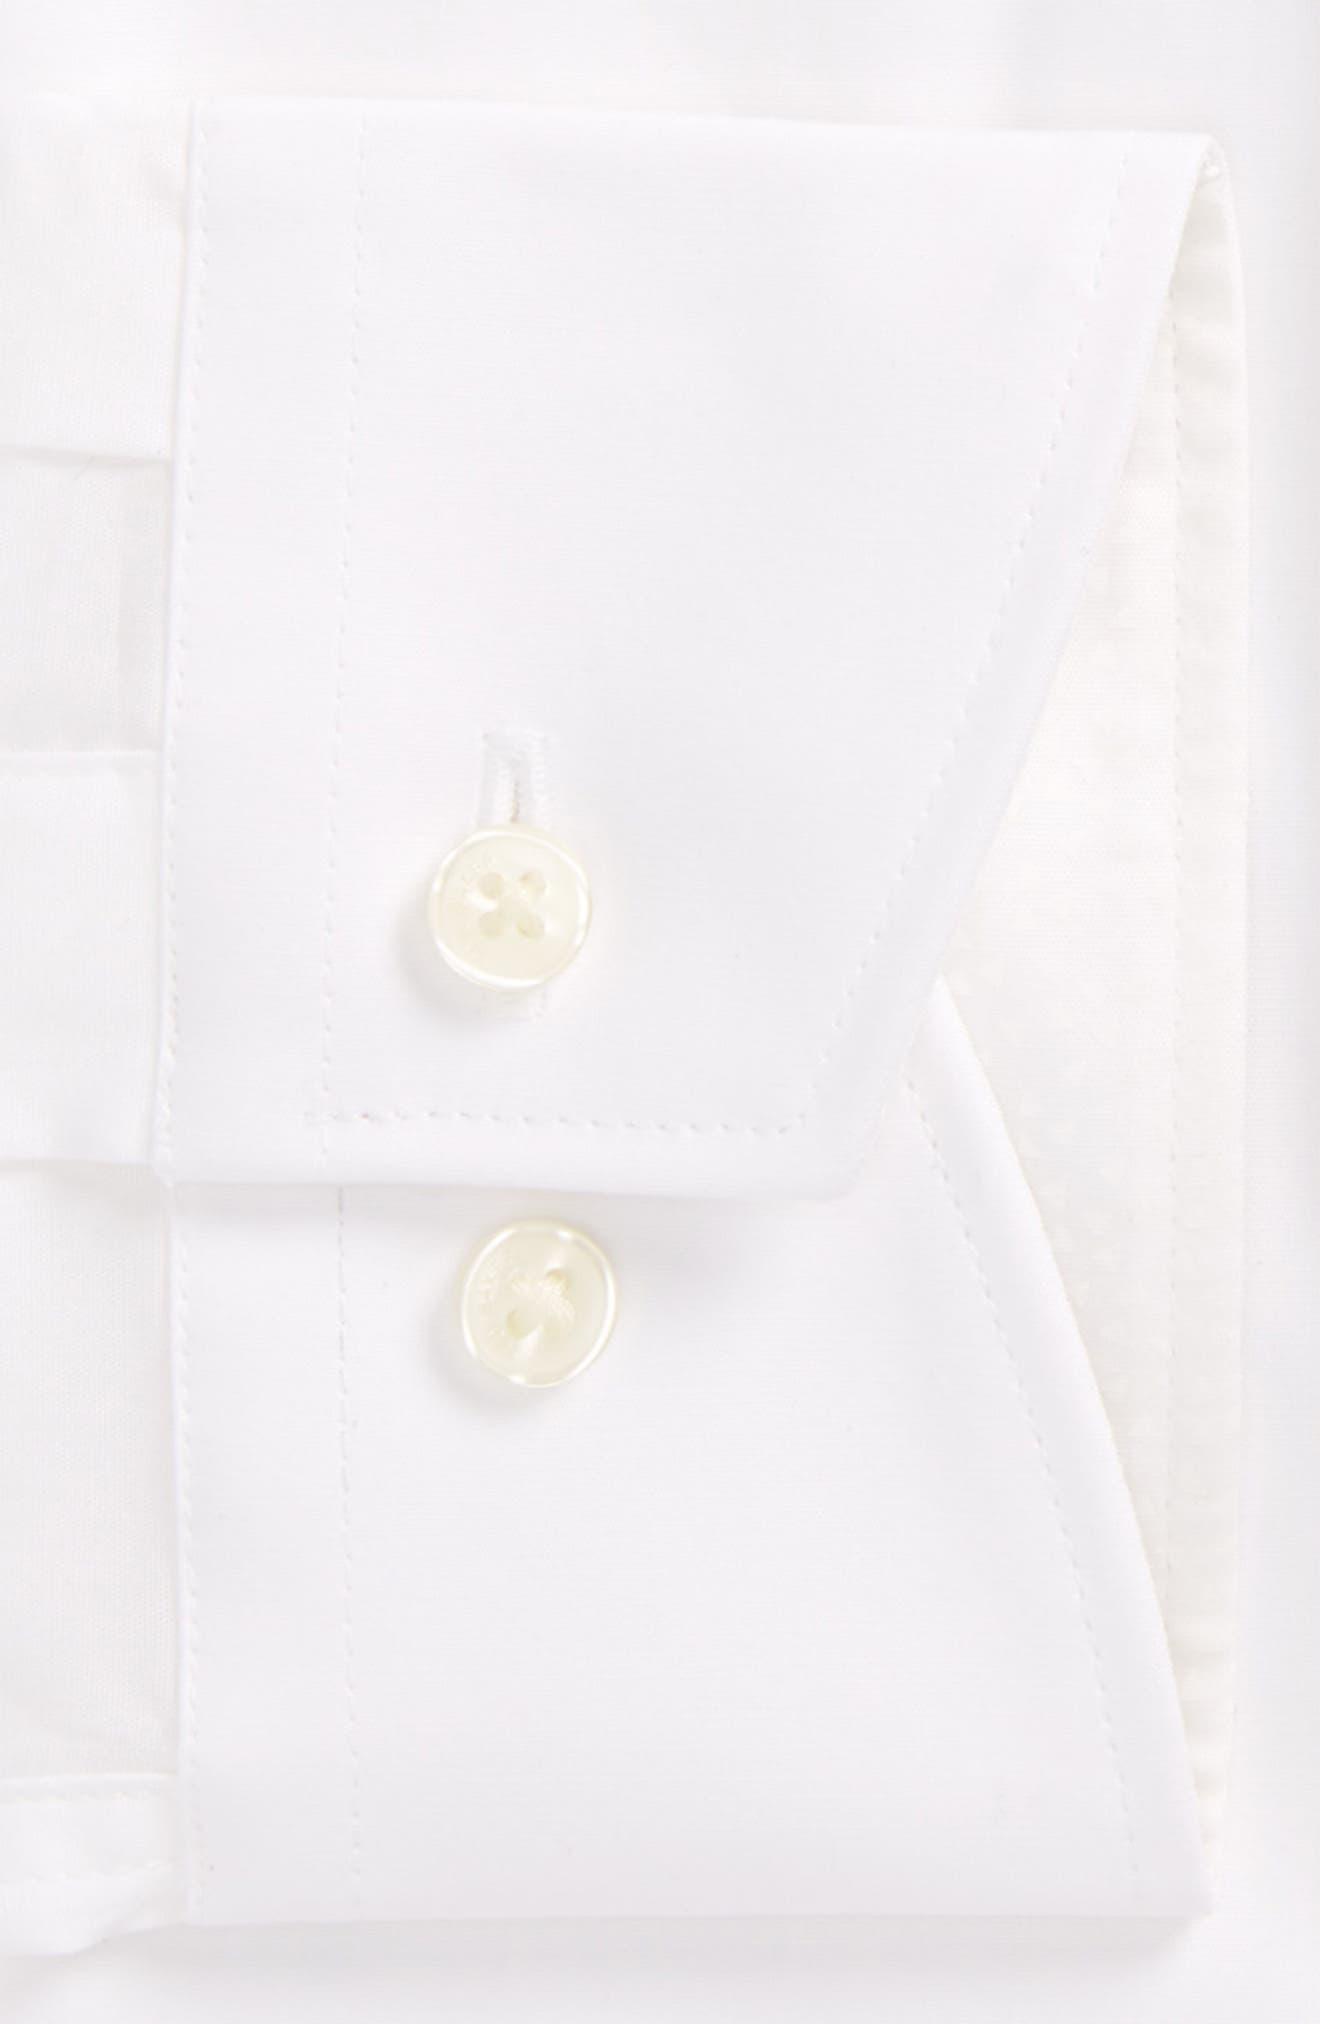 Booker Slim Fit Dress Shirt,                             Alternate thumbnail 3, color,                             110